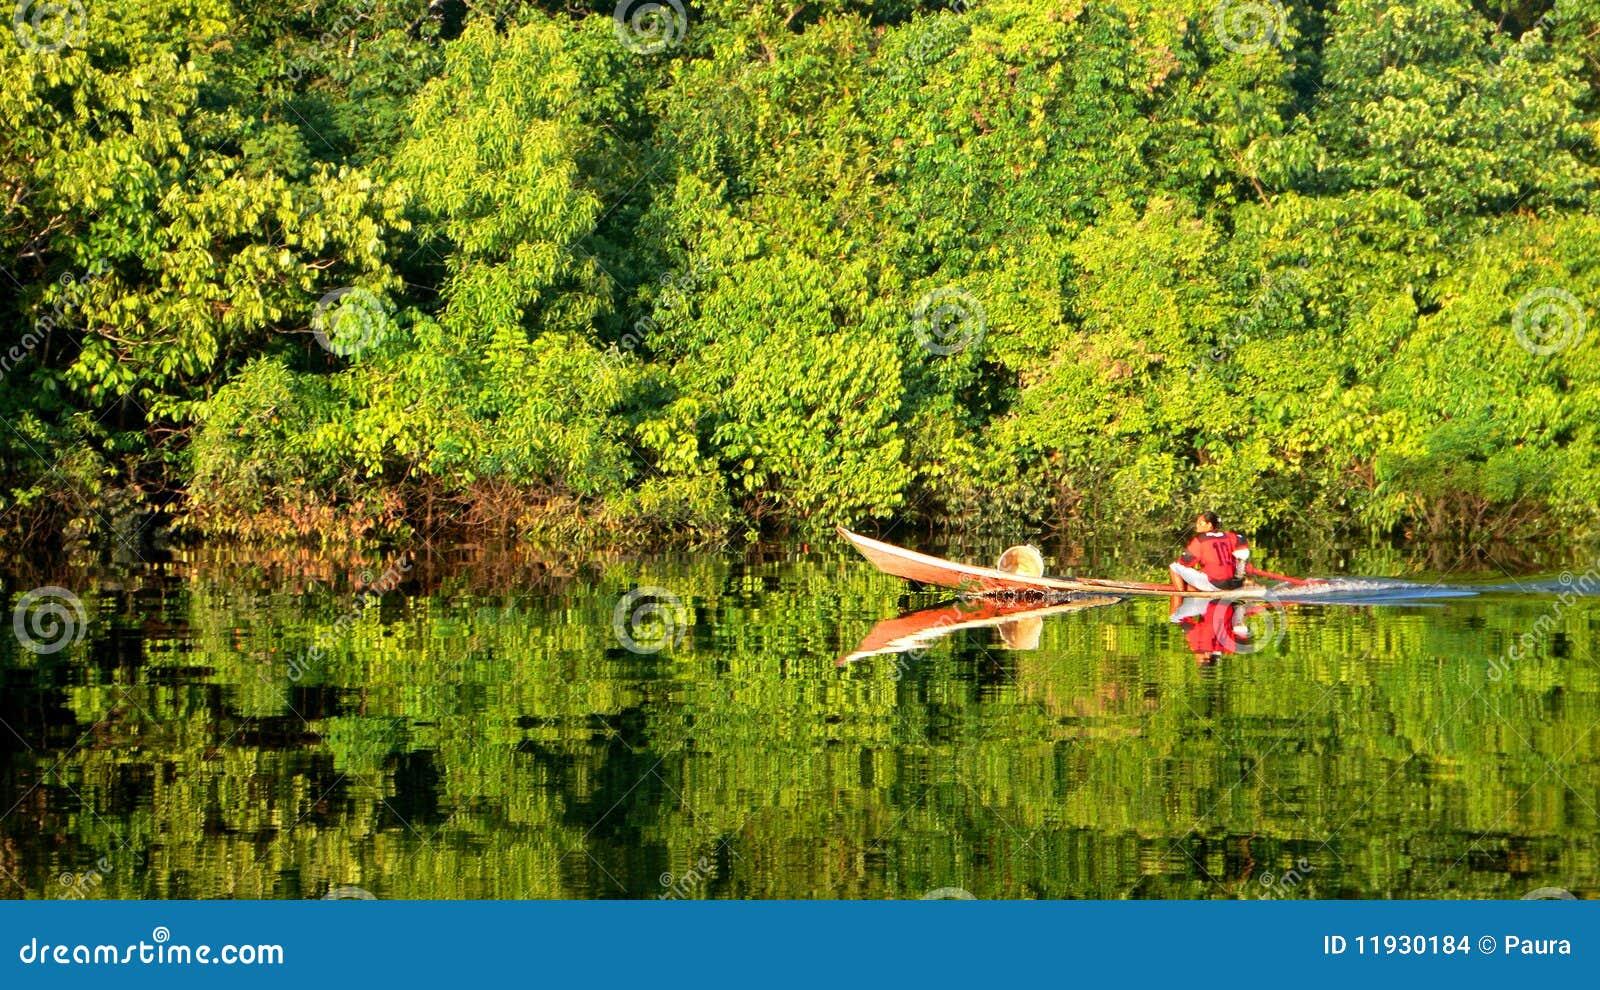 Life in Amazon Jungle (The Amazonia)